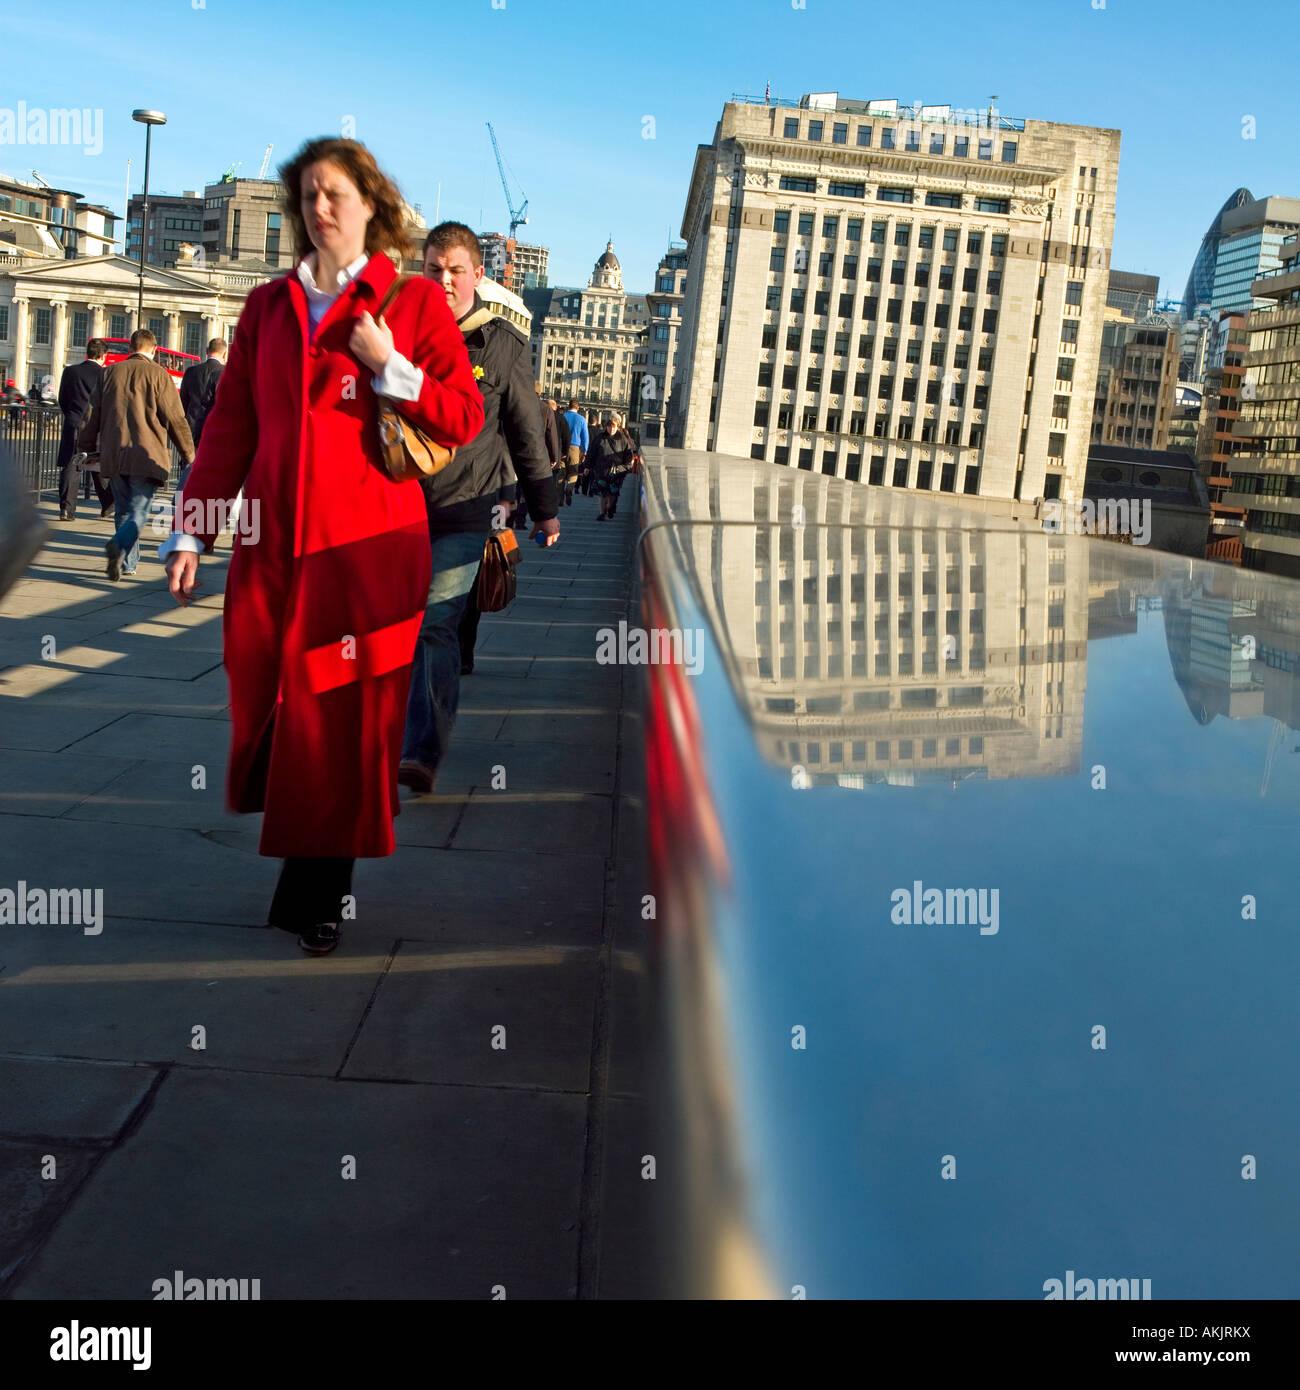 Early Morning London Commuters Crossing Bridge Woman In Red Coat